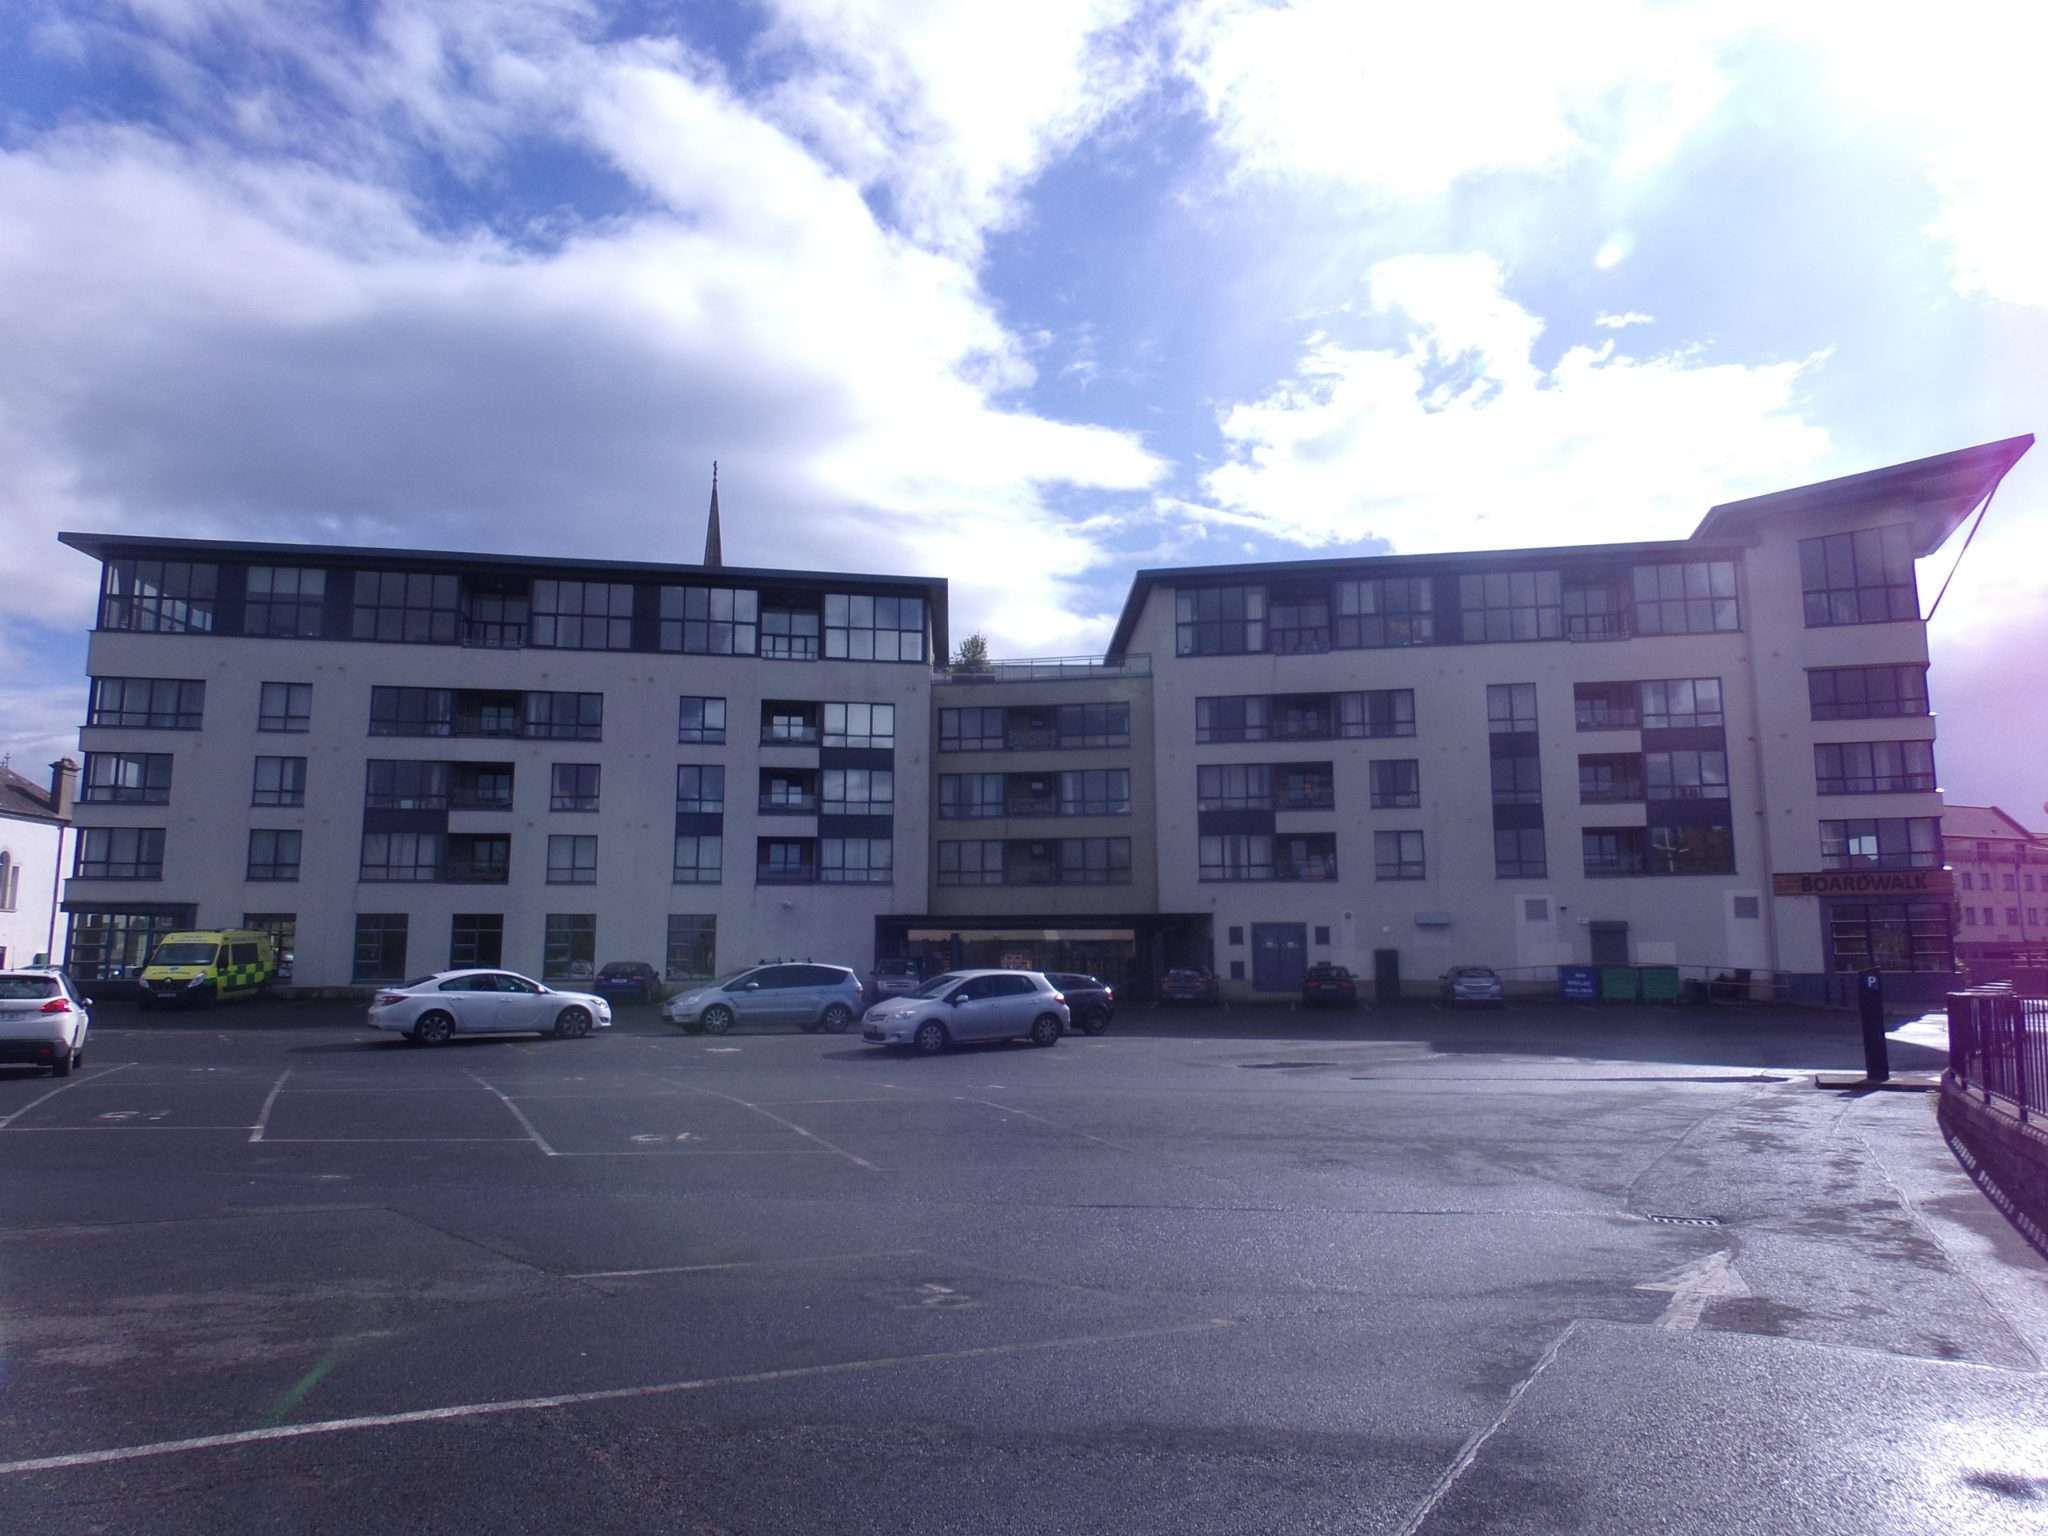 Unit 4 Riverdell, Haymarket, Carlow